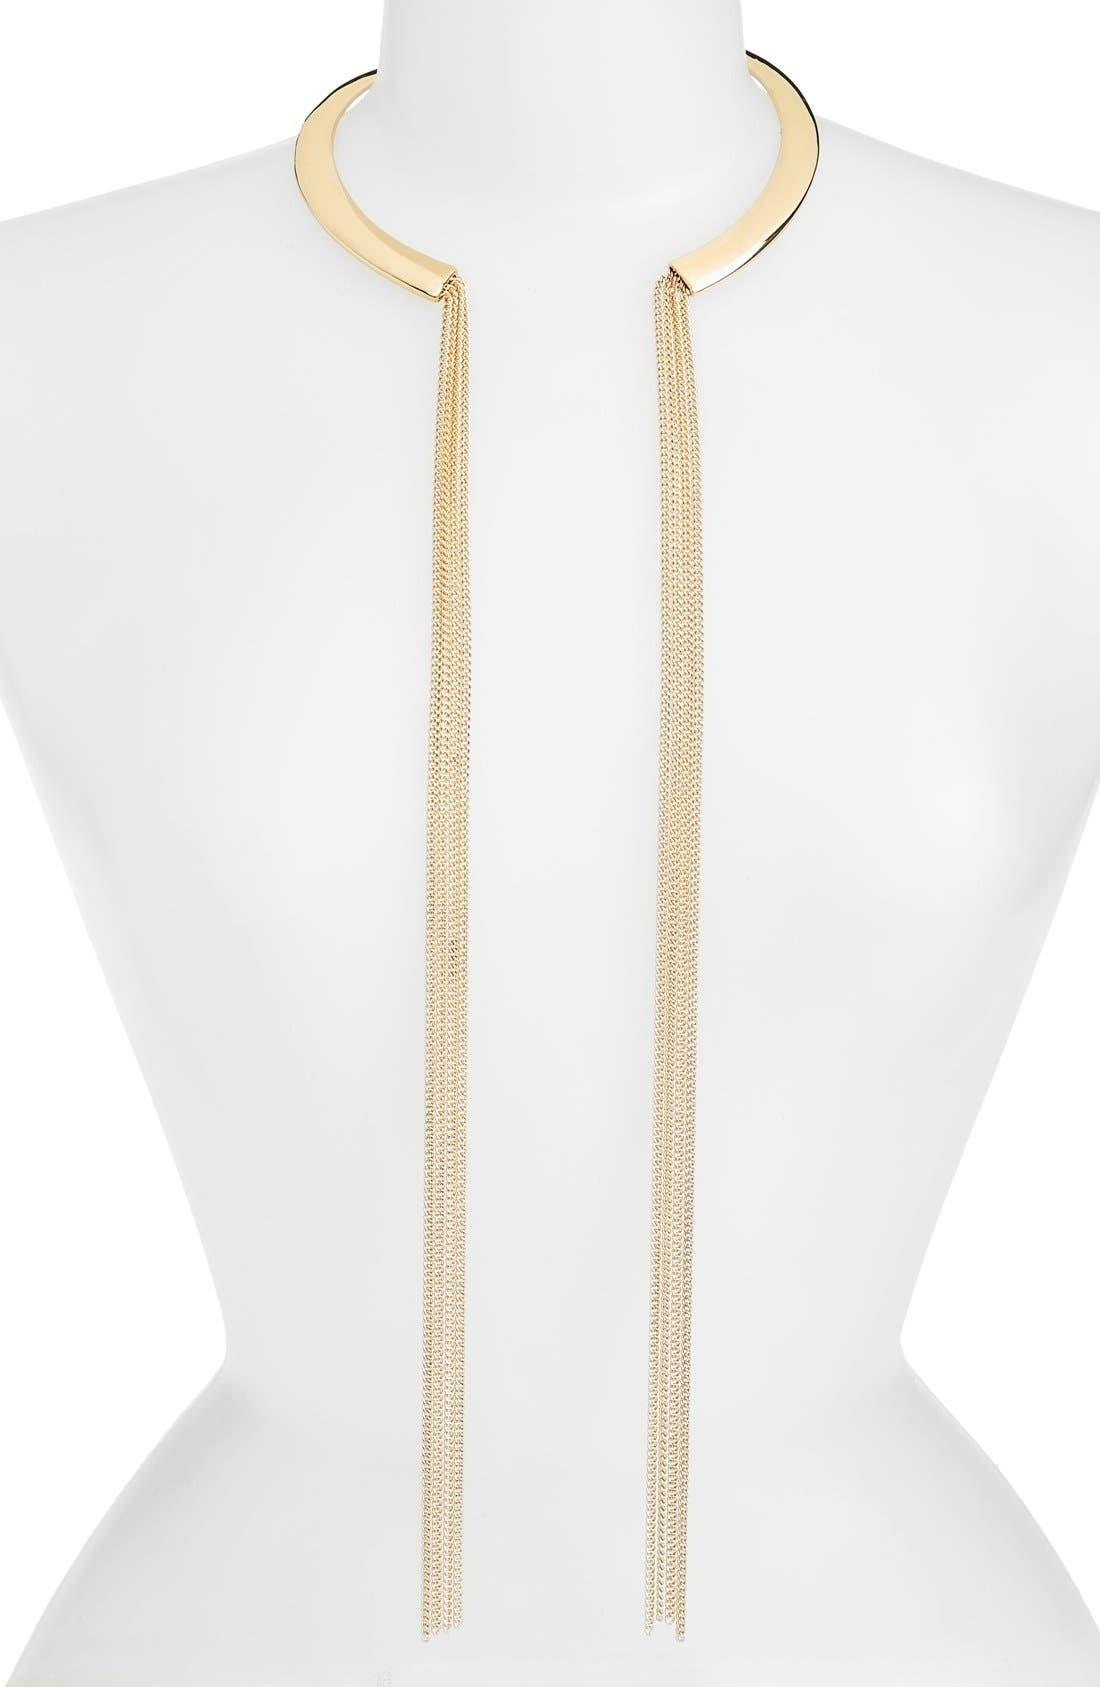 Main Image - Nordstrom Chain Tassel Collar Necklace